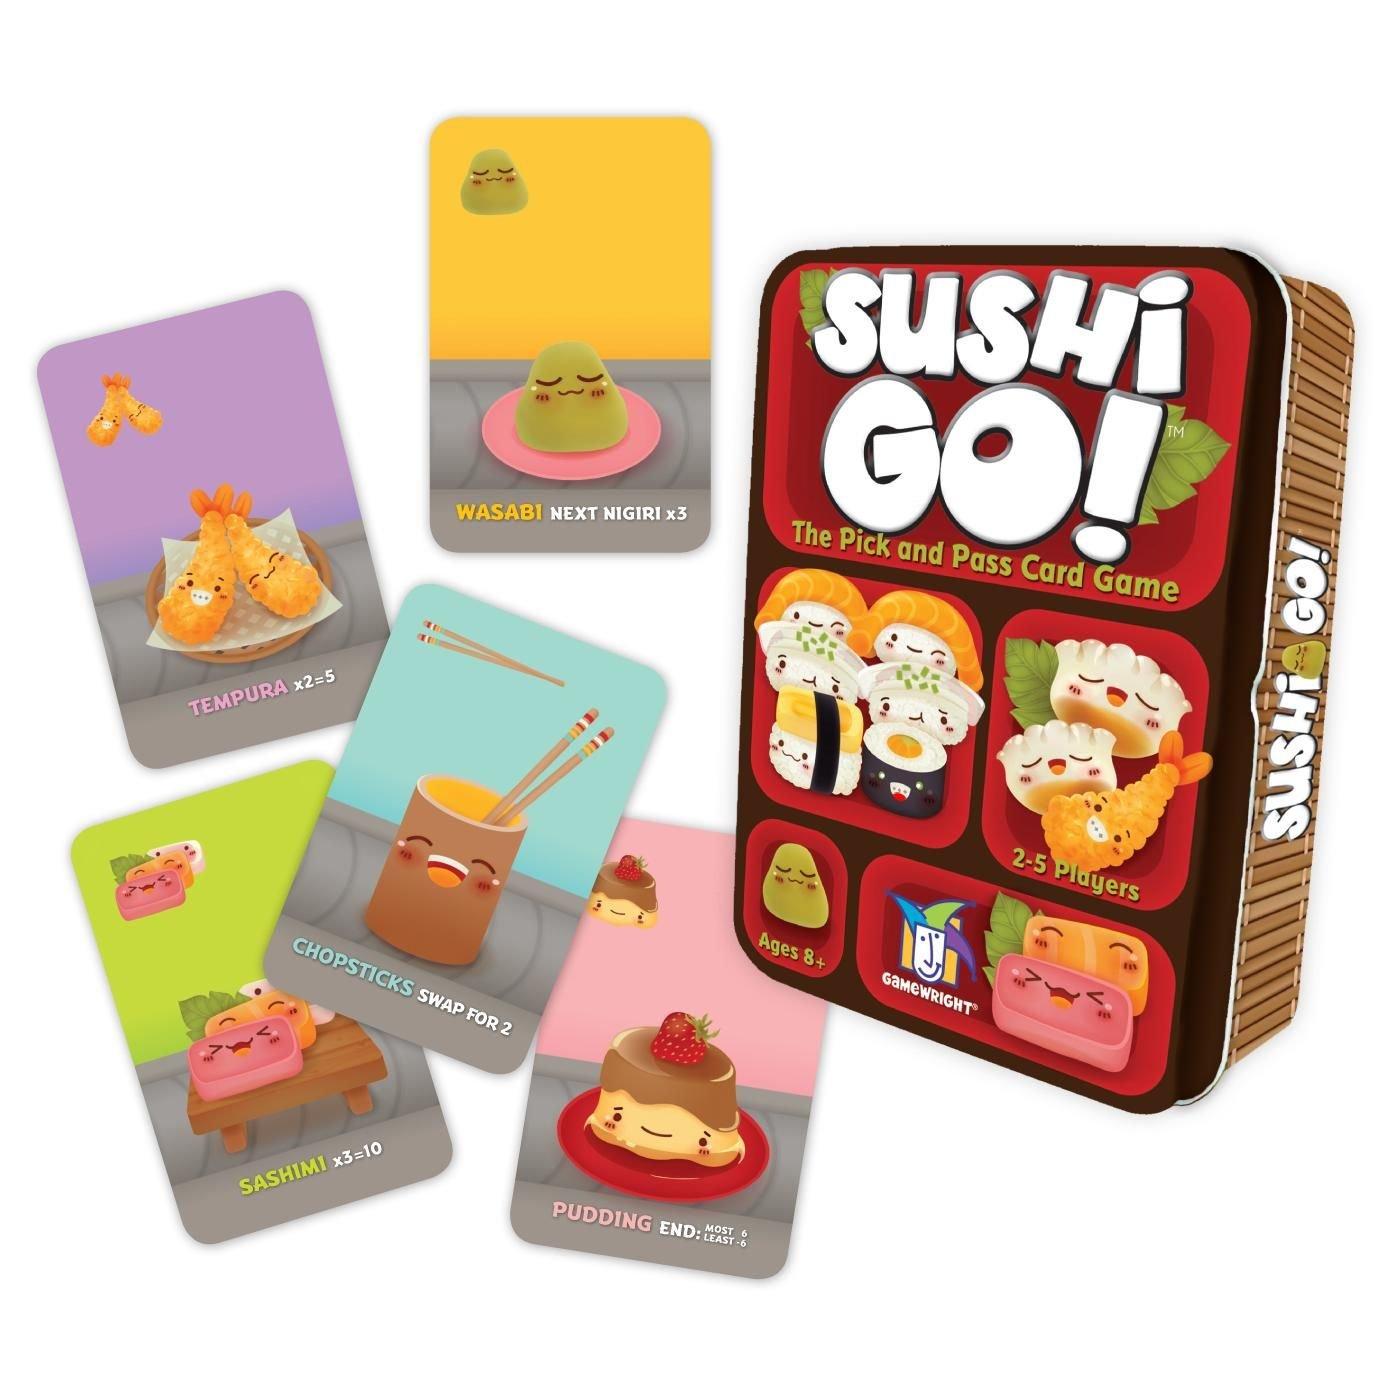 http://www.amazon.com/Sushi-Go-Pick-Pass-Card/dp/B00J57VU44/ref=sr_1_1?s=toys-and-games&ie=UTF8&qid=1434457950&sr=1-1&keywords=sushi+go